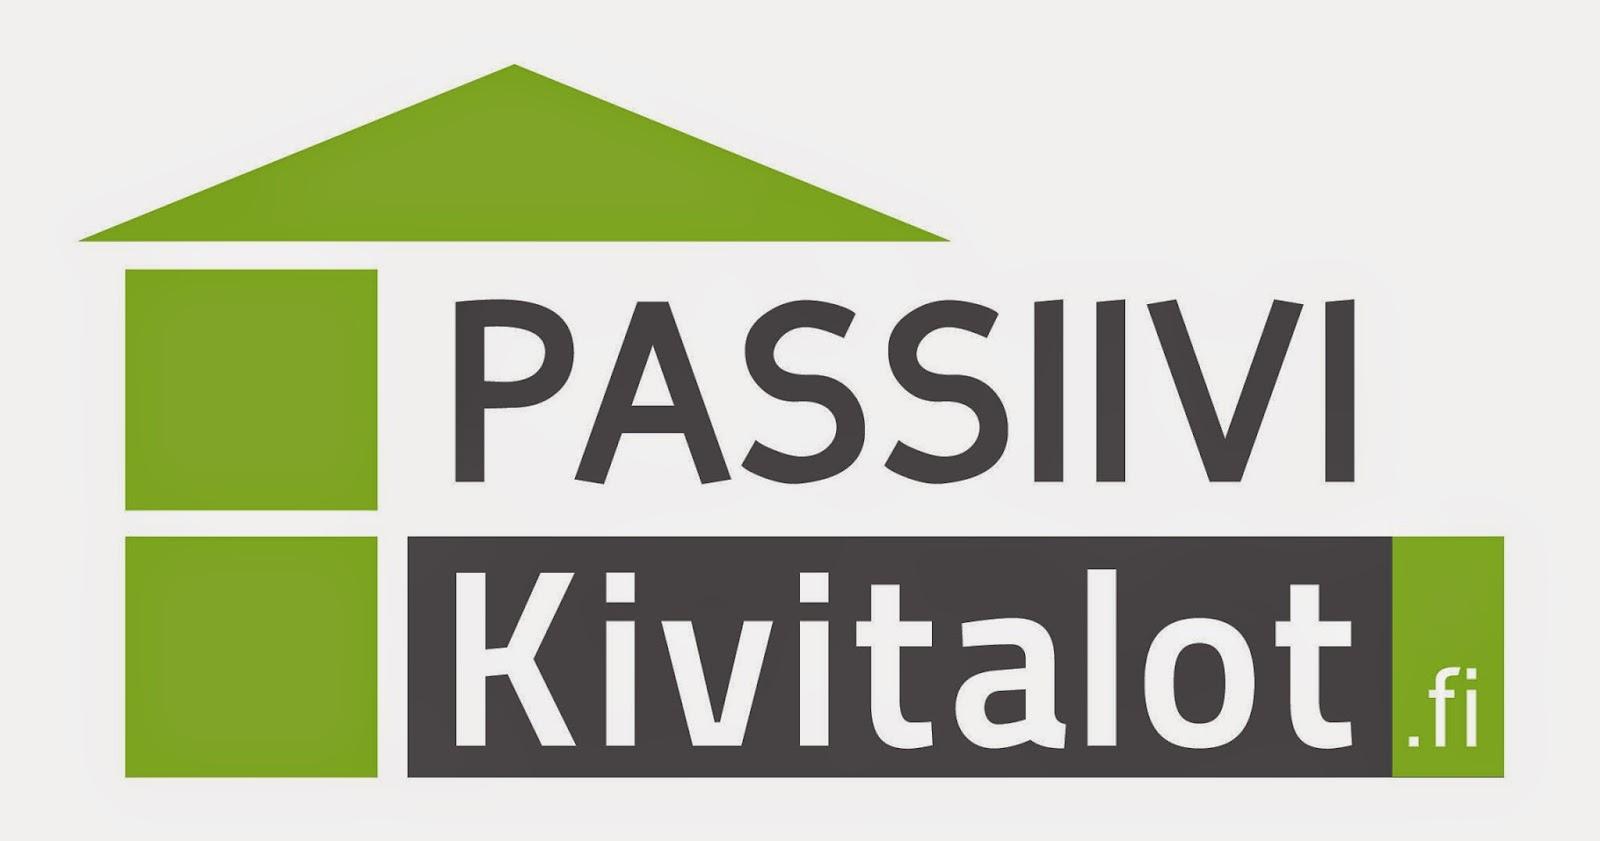 http://www.passiivikivitalot.fi/